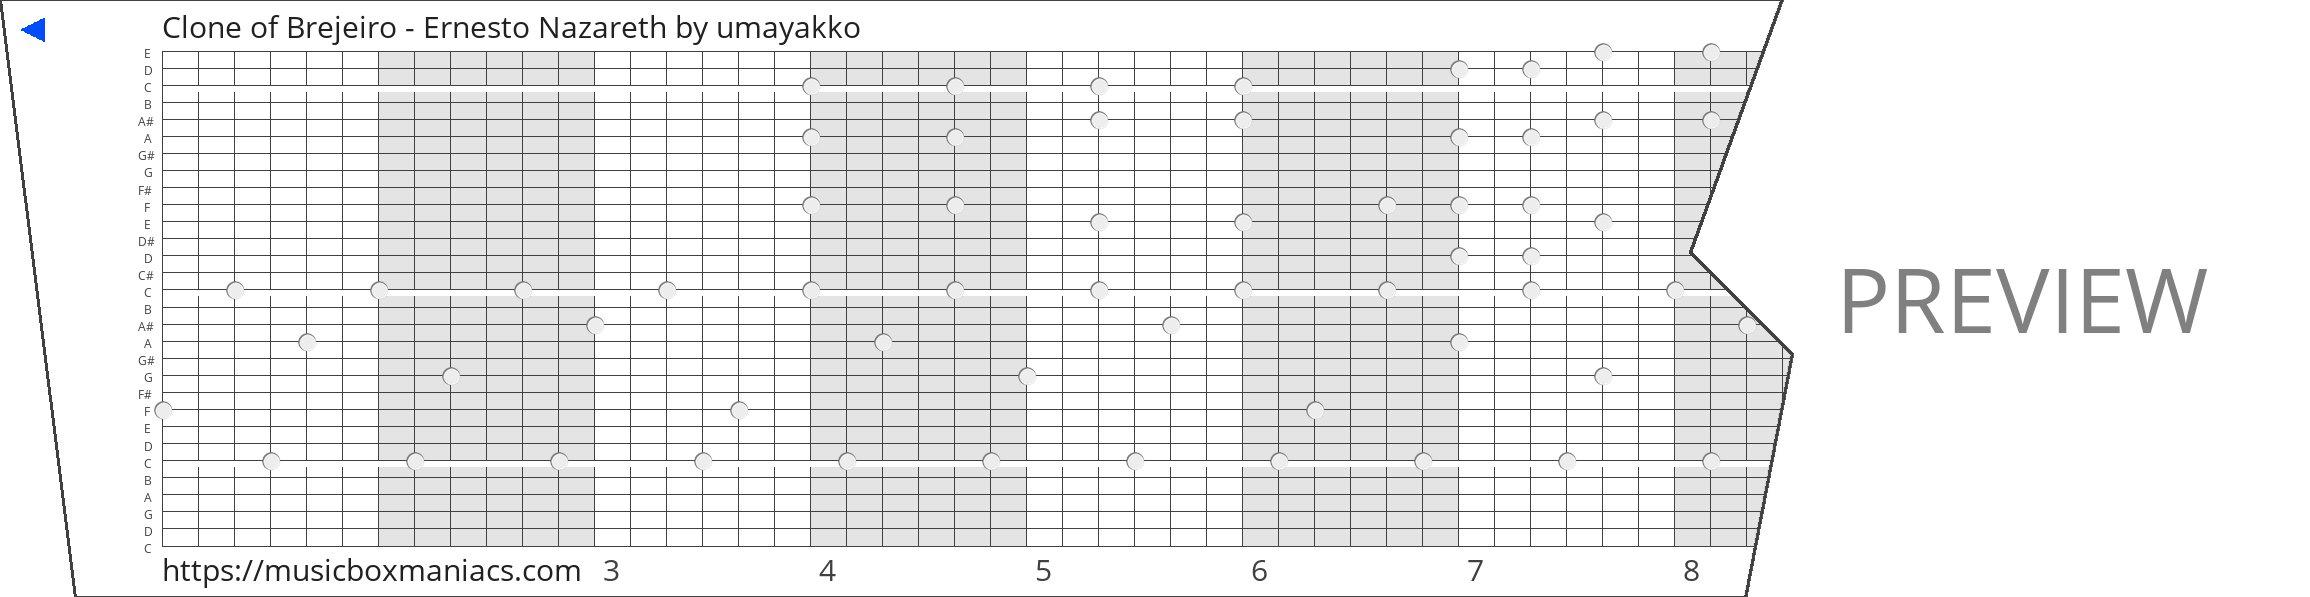 Clone of Brejeiro - Ernesto Nazareth 30 note music box paper strip